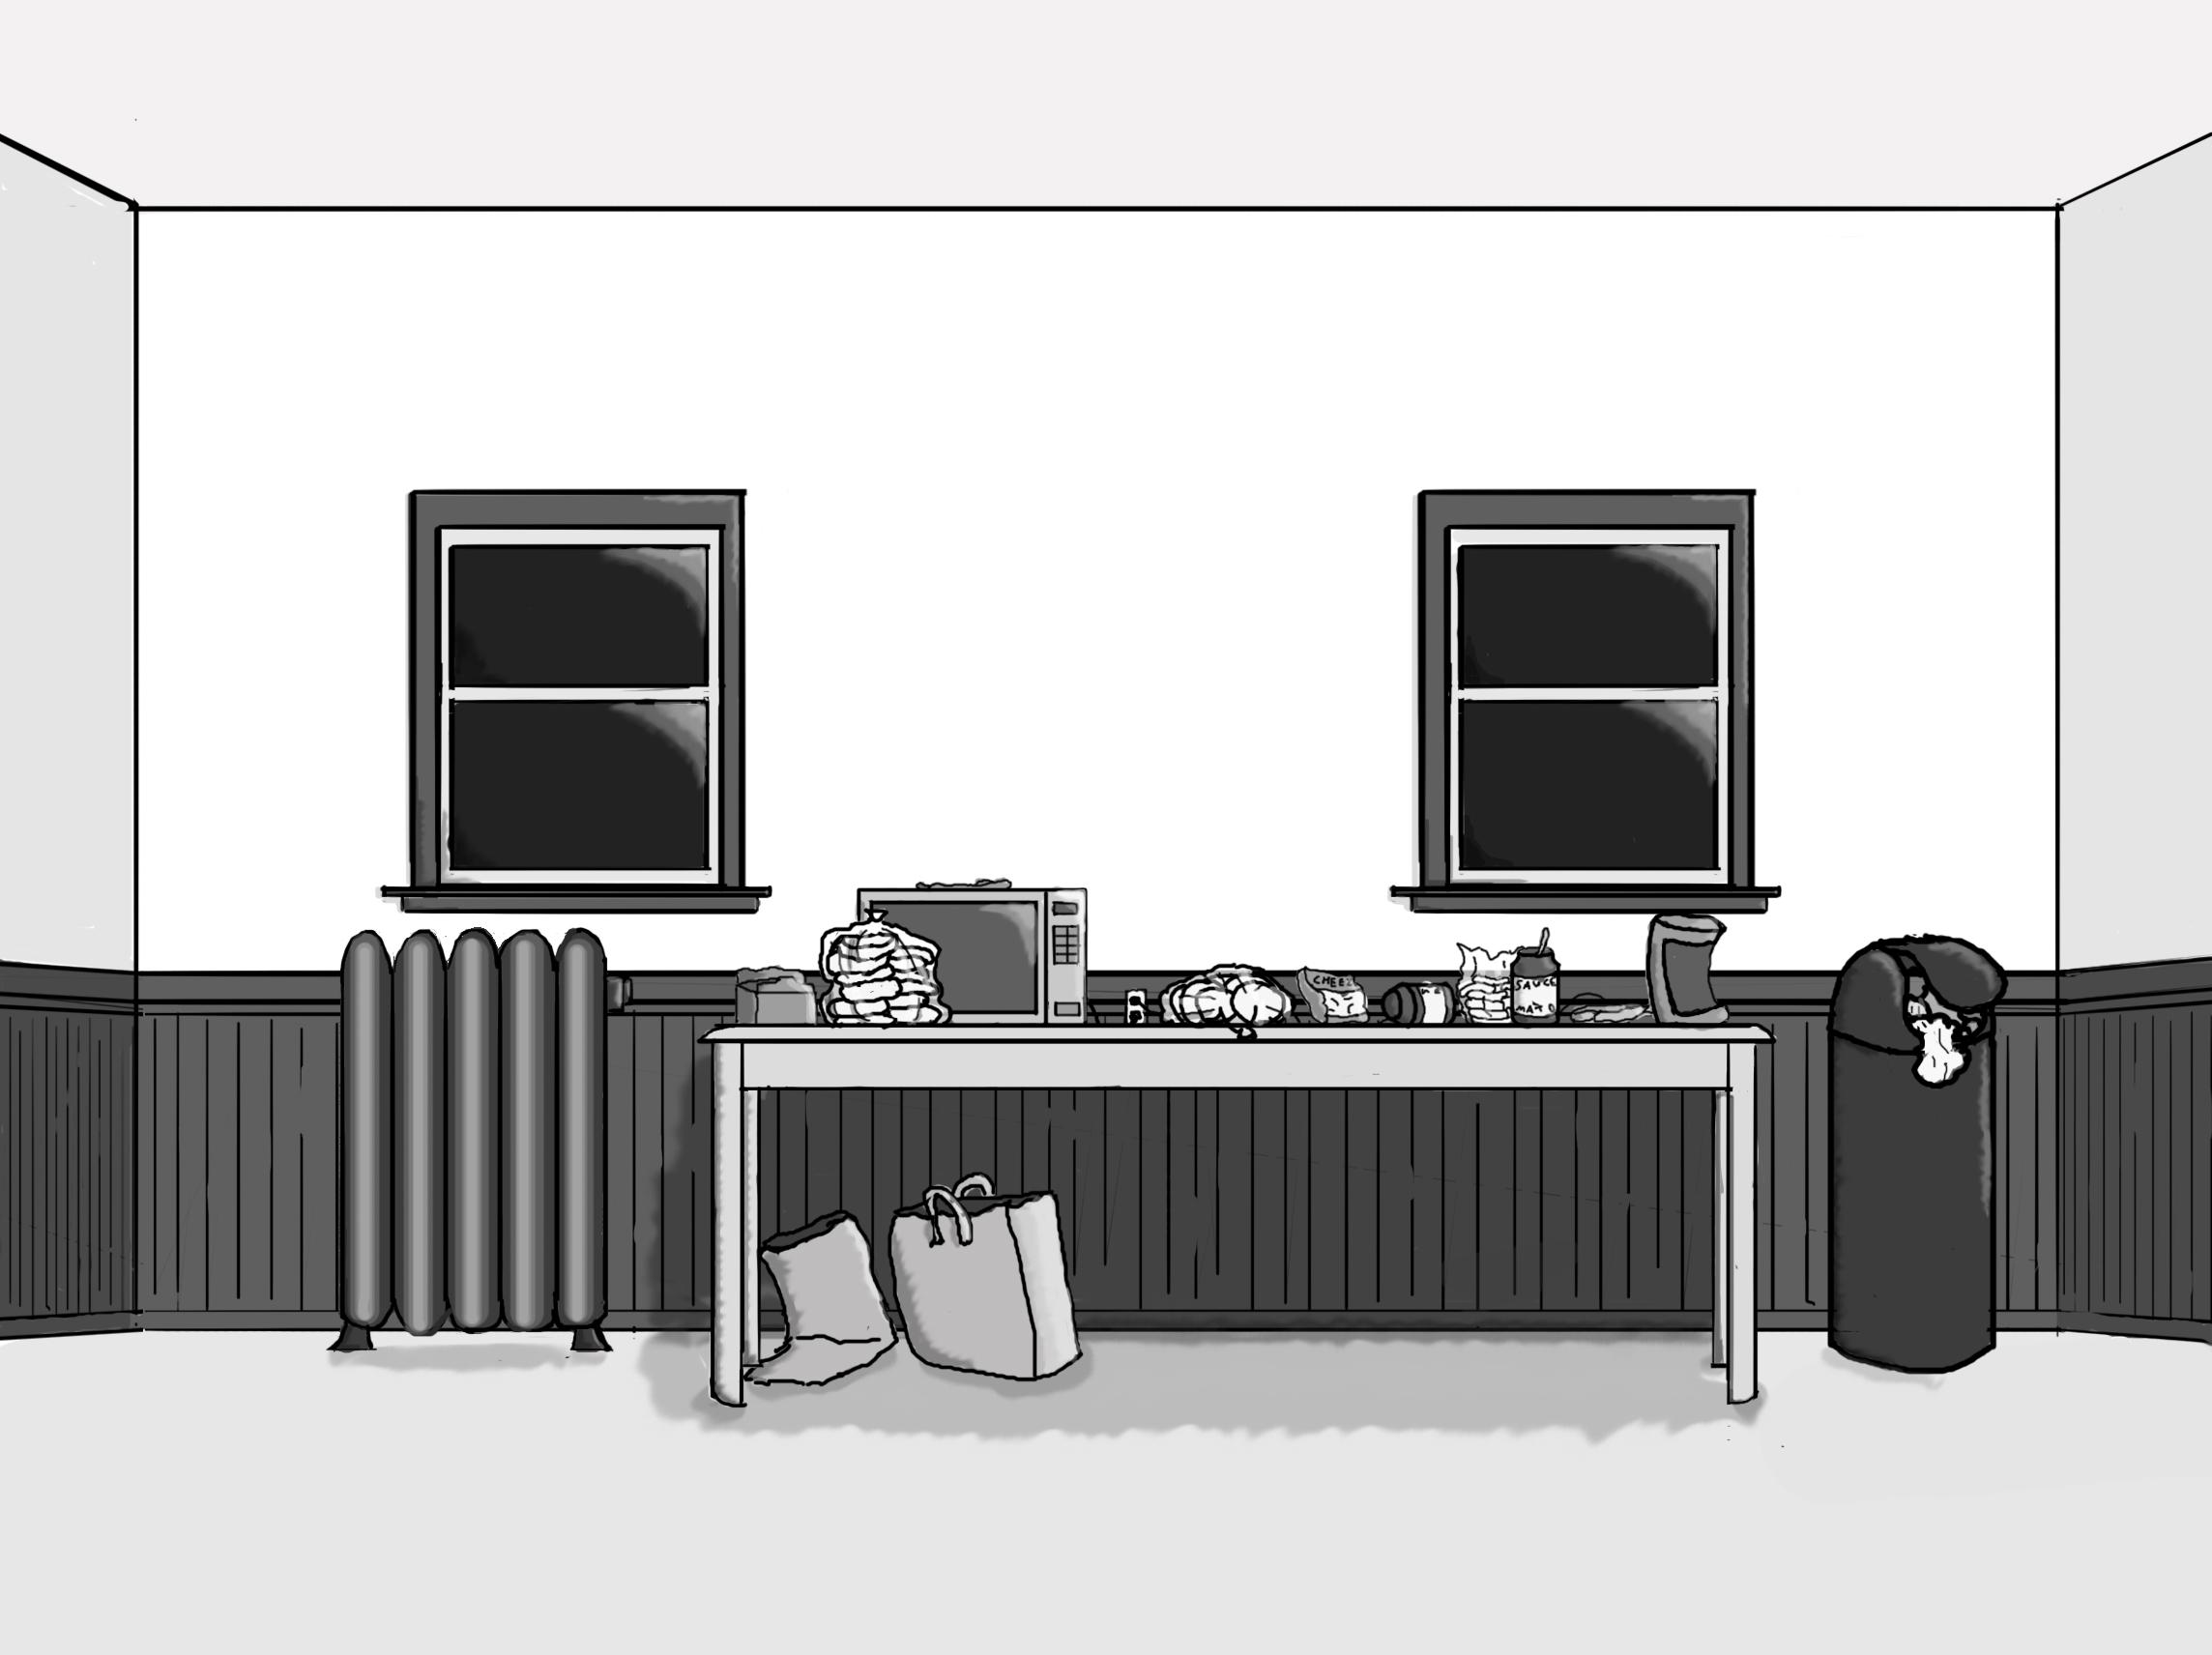 Pizza Waffles Background 1